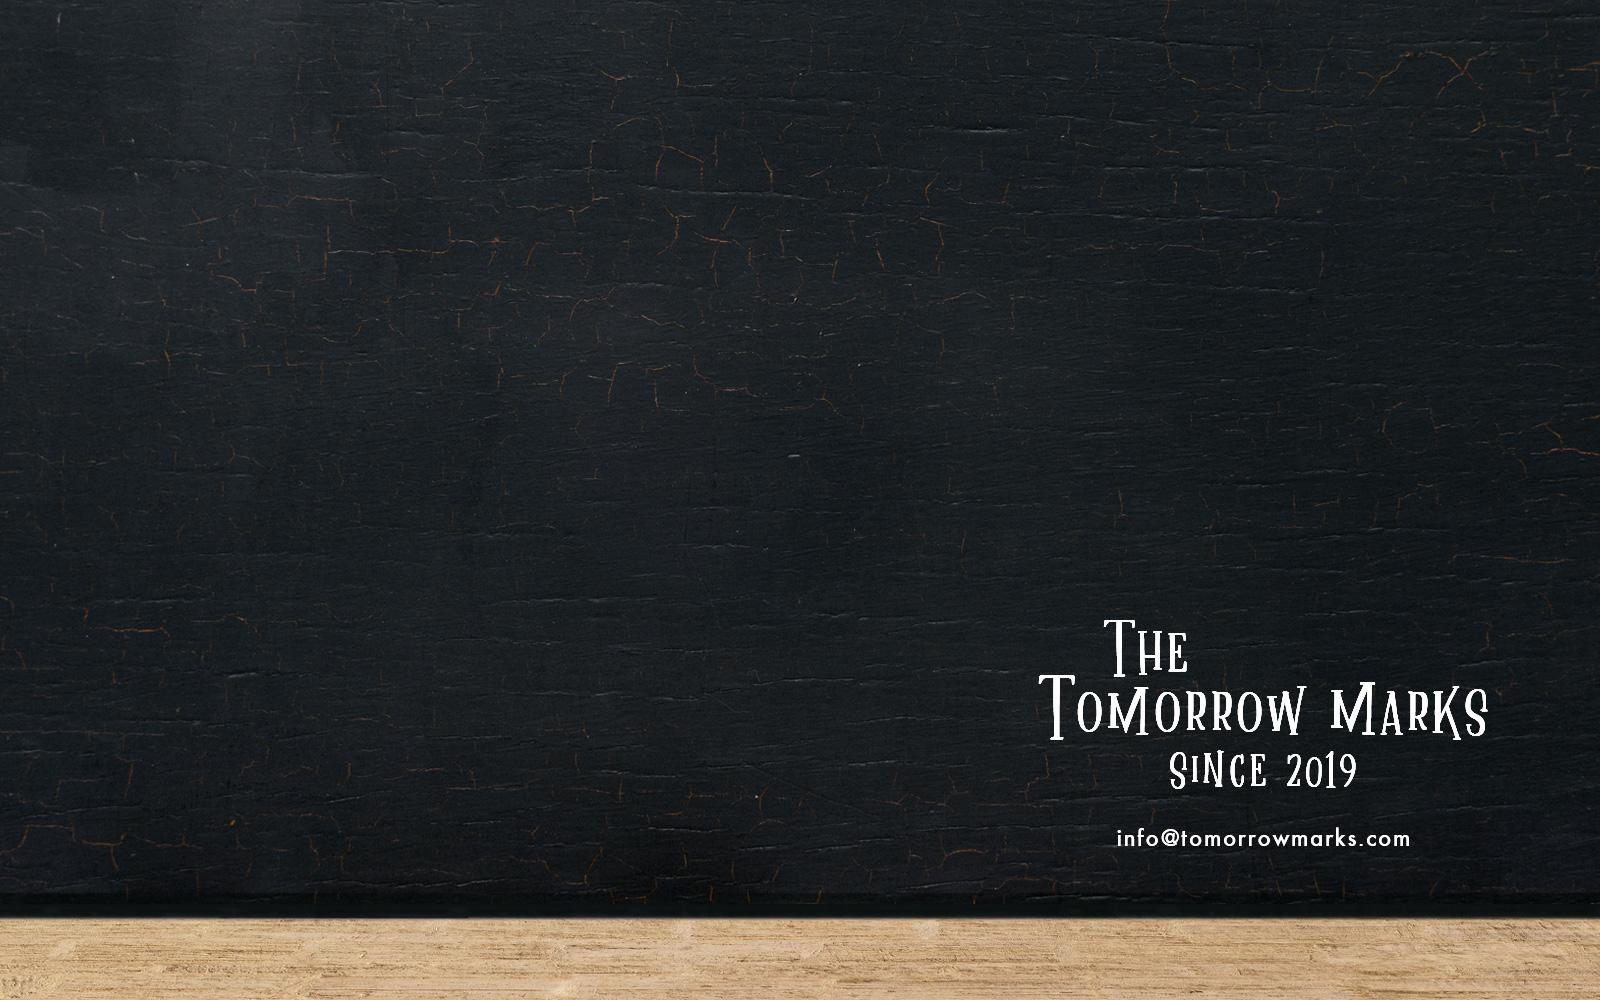 【Introduce】Tomorrow marks